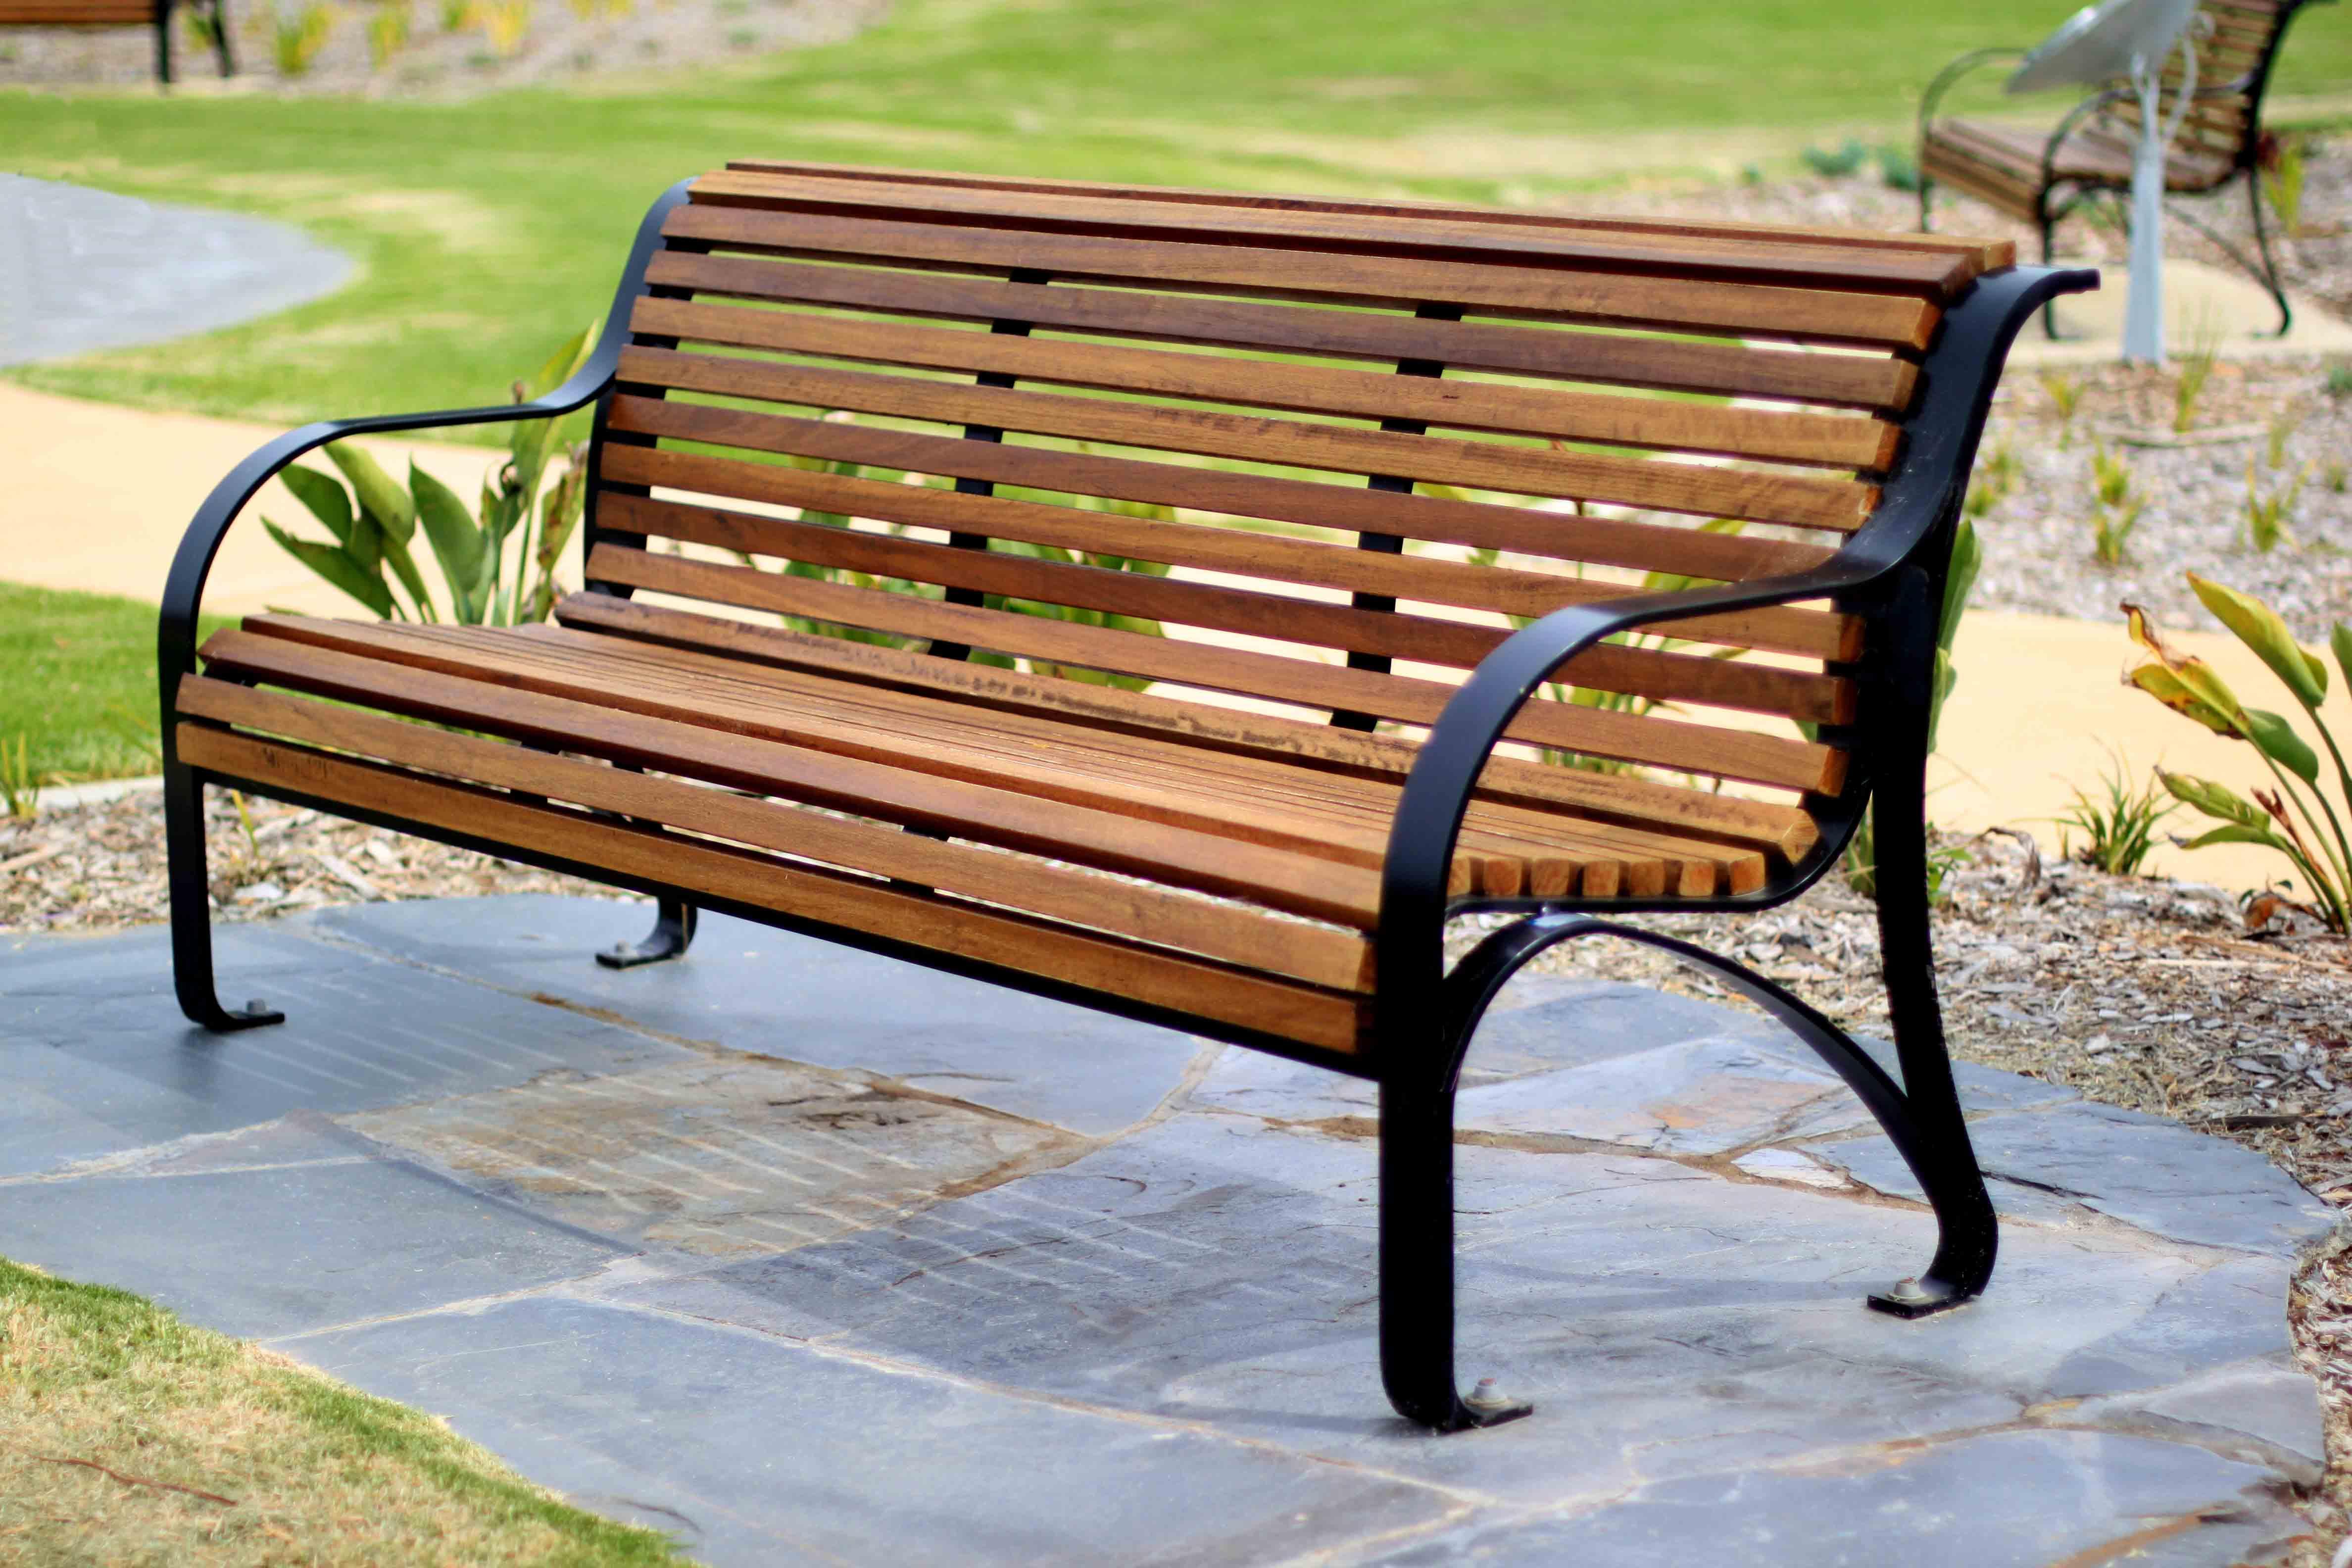 Standard Bench Seat Height Australia